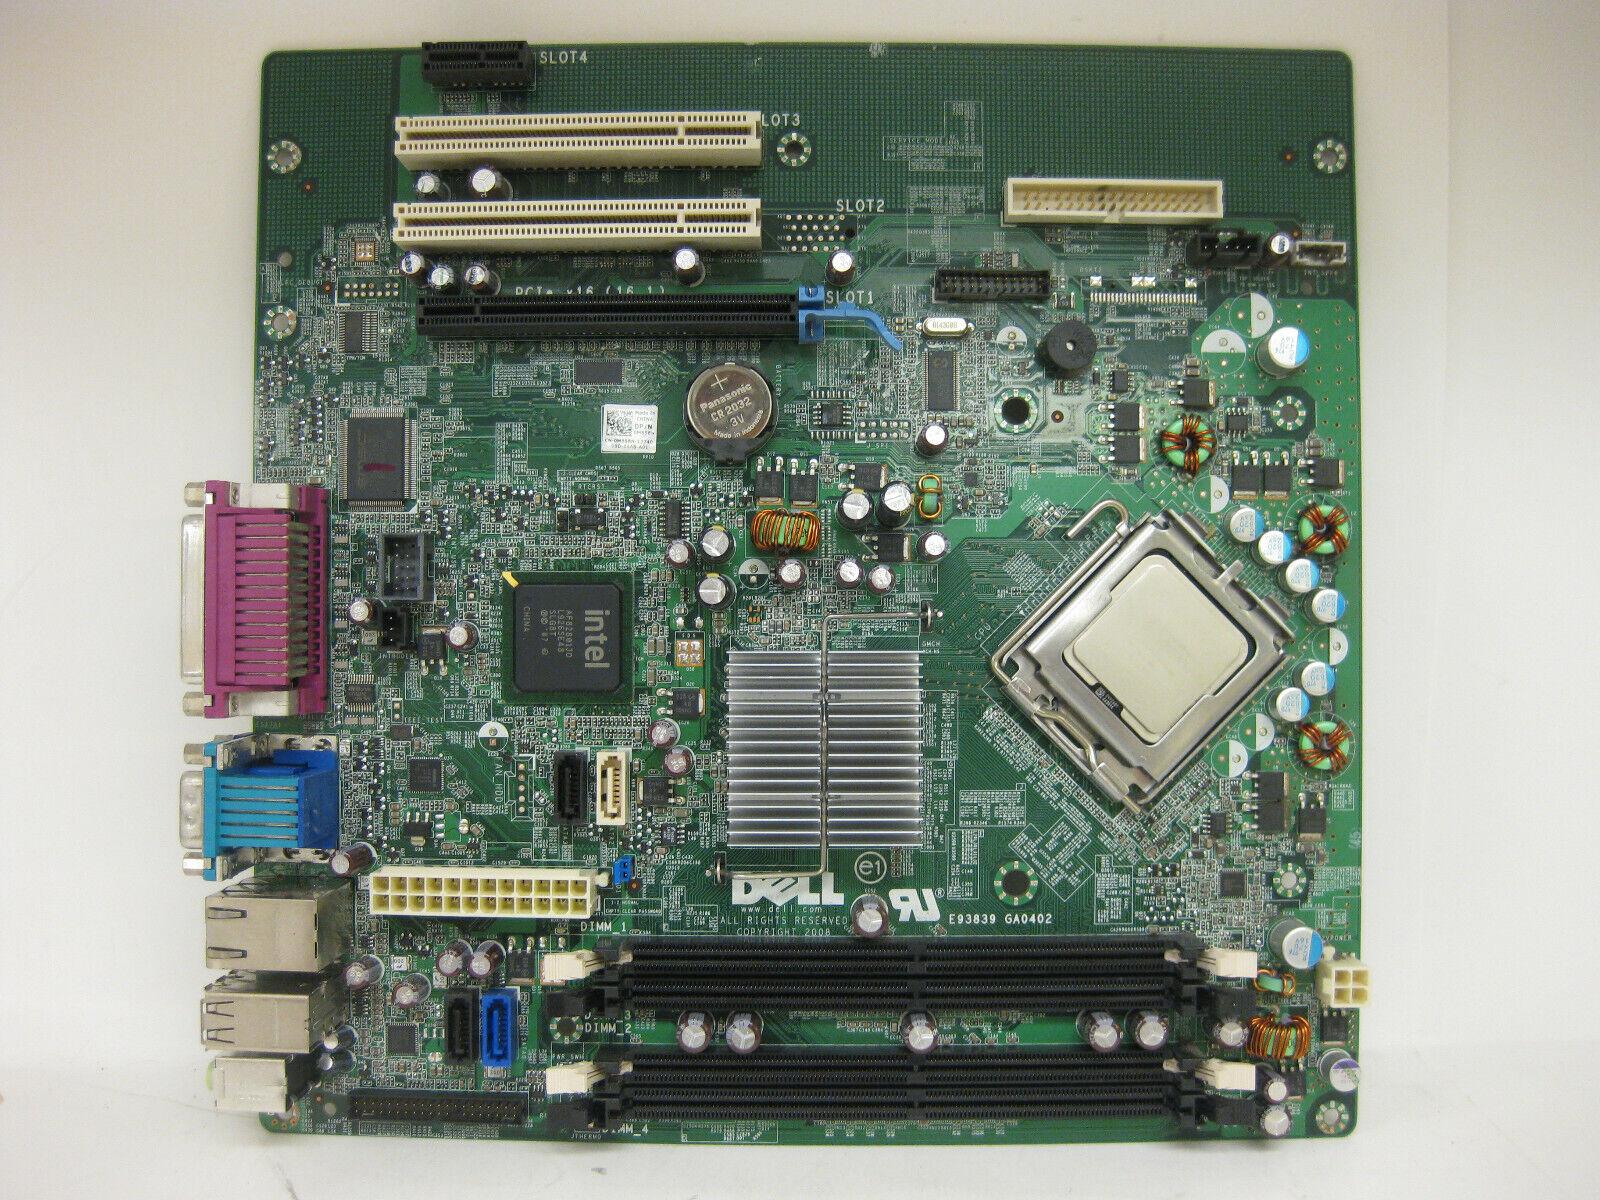 Dell OptiPlex 760 MT Motherboard LGA775 G214D with Core 2 Duo 3.16Ghz Processor